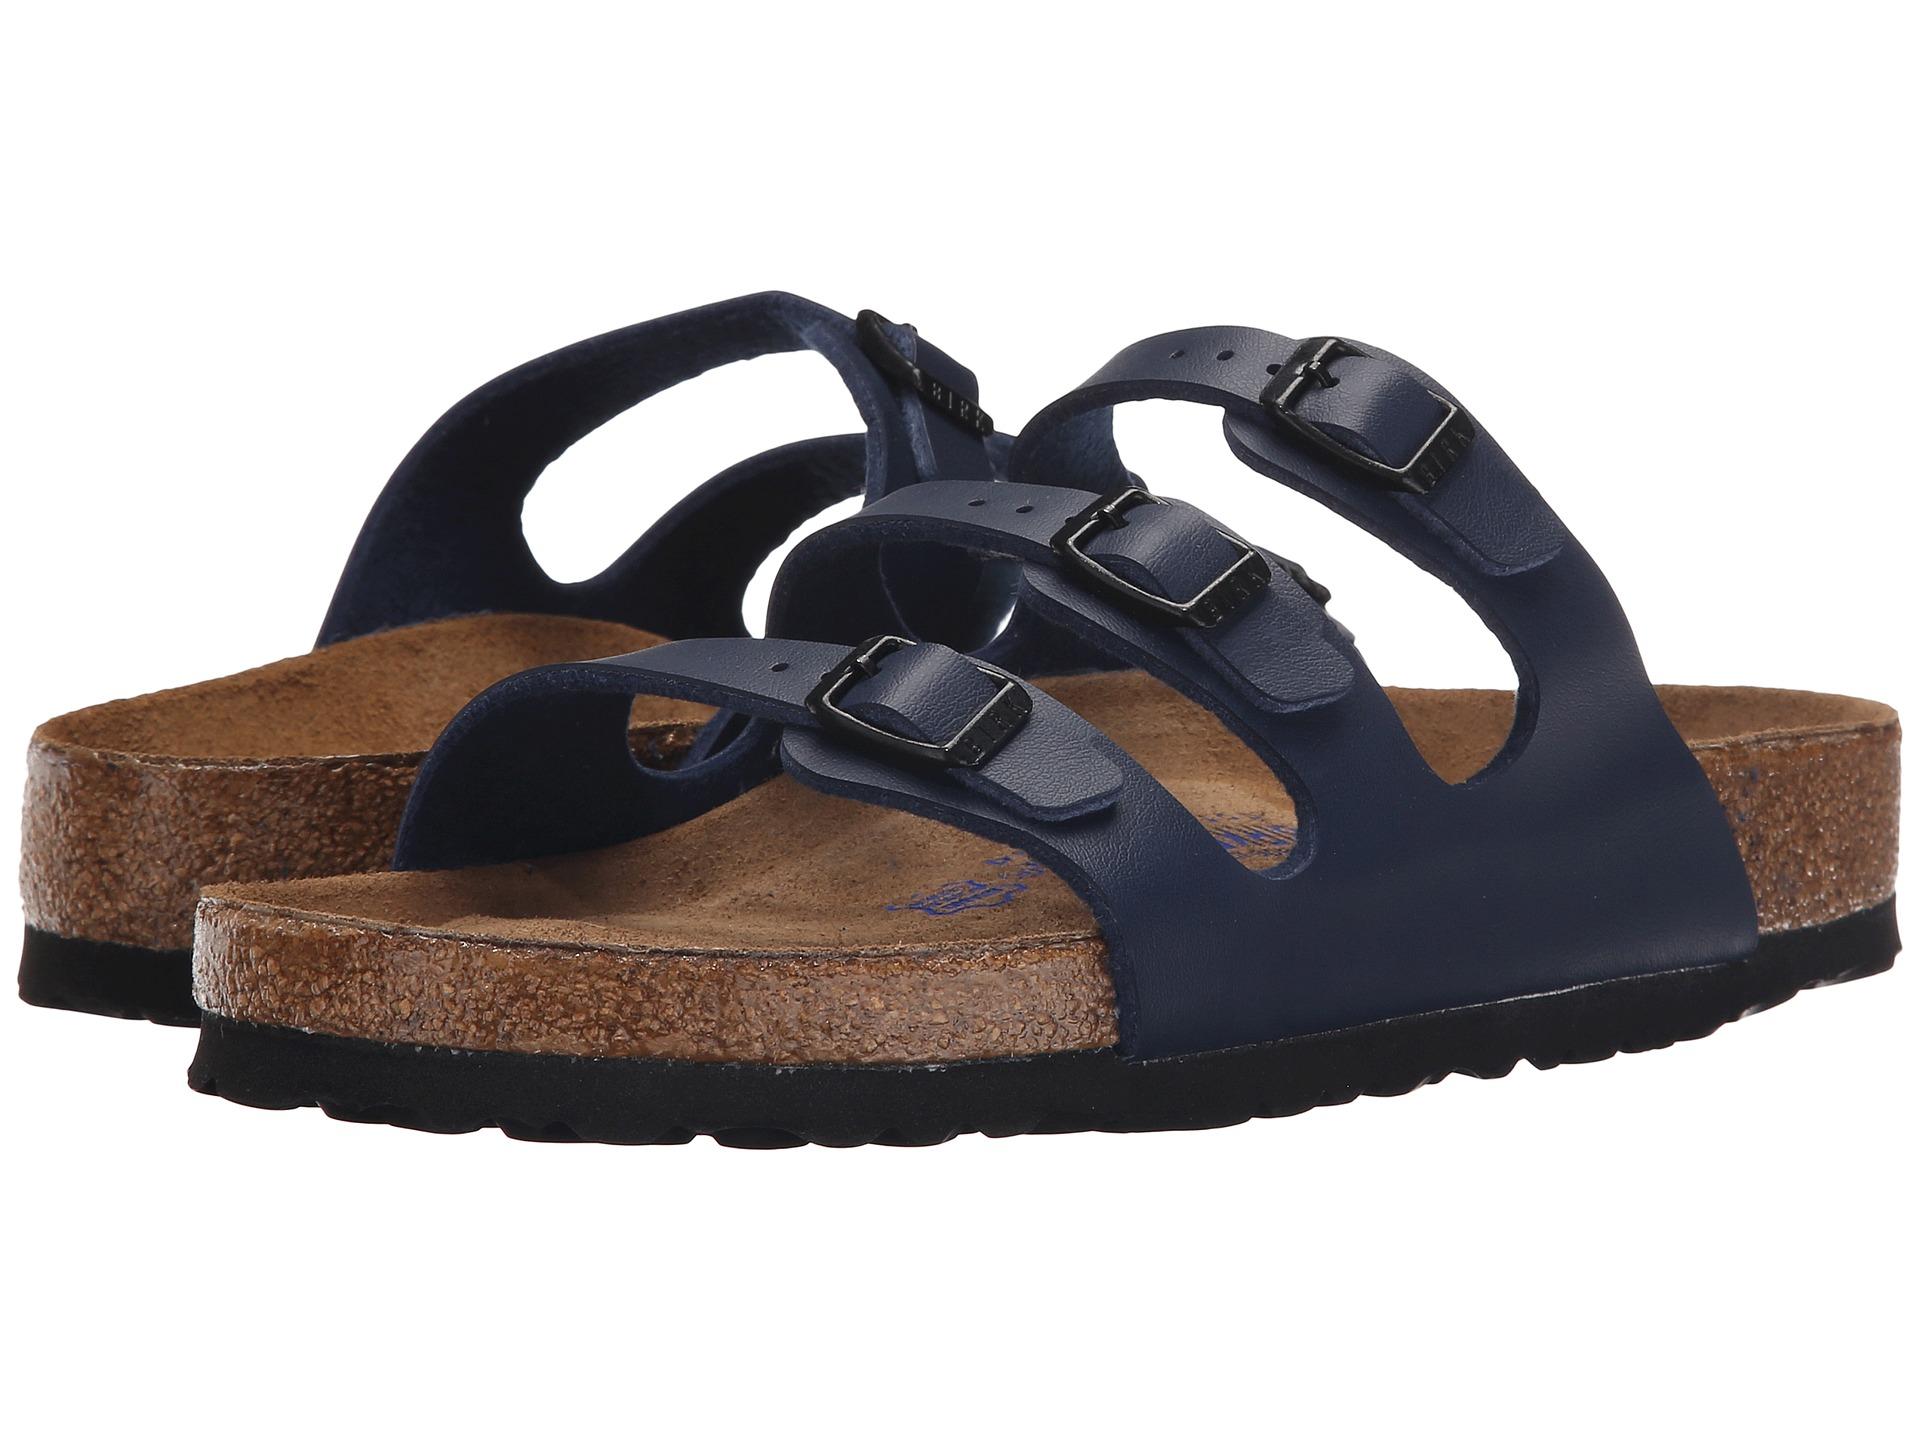 birkenstock florida soft footbed - birko-flor™ at zappos